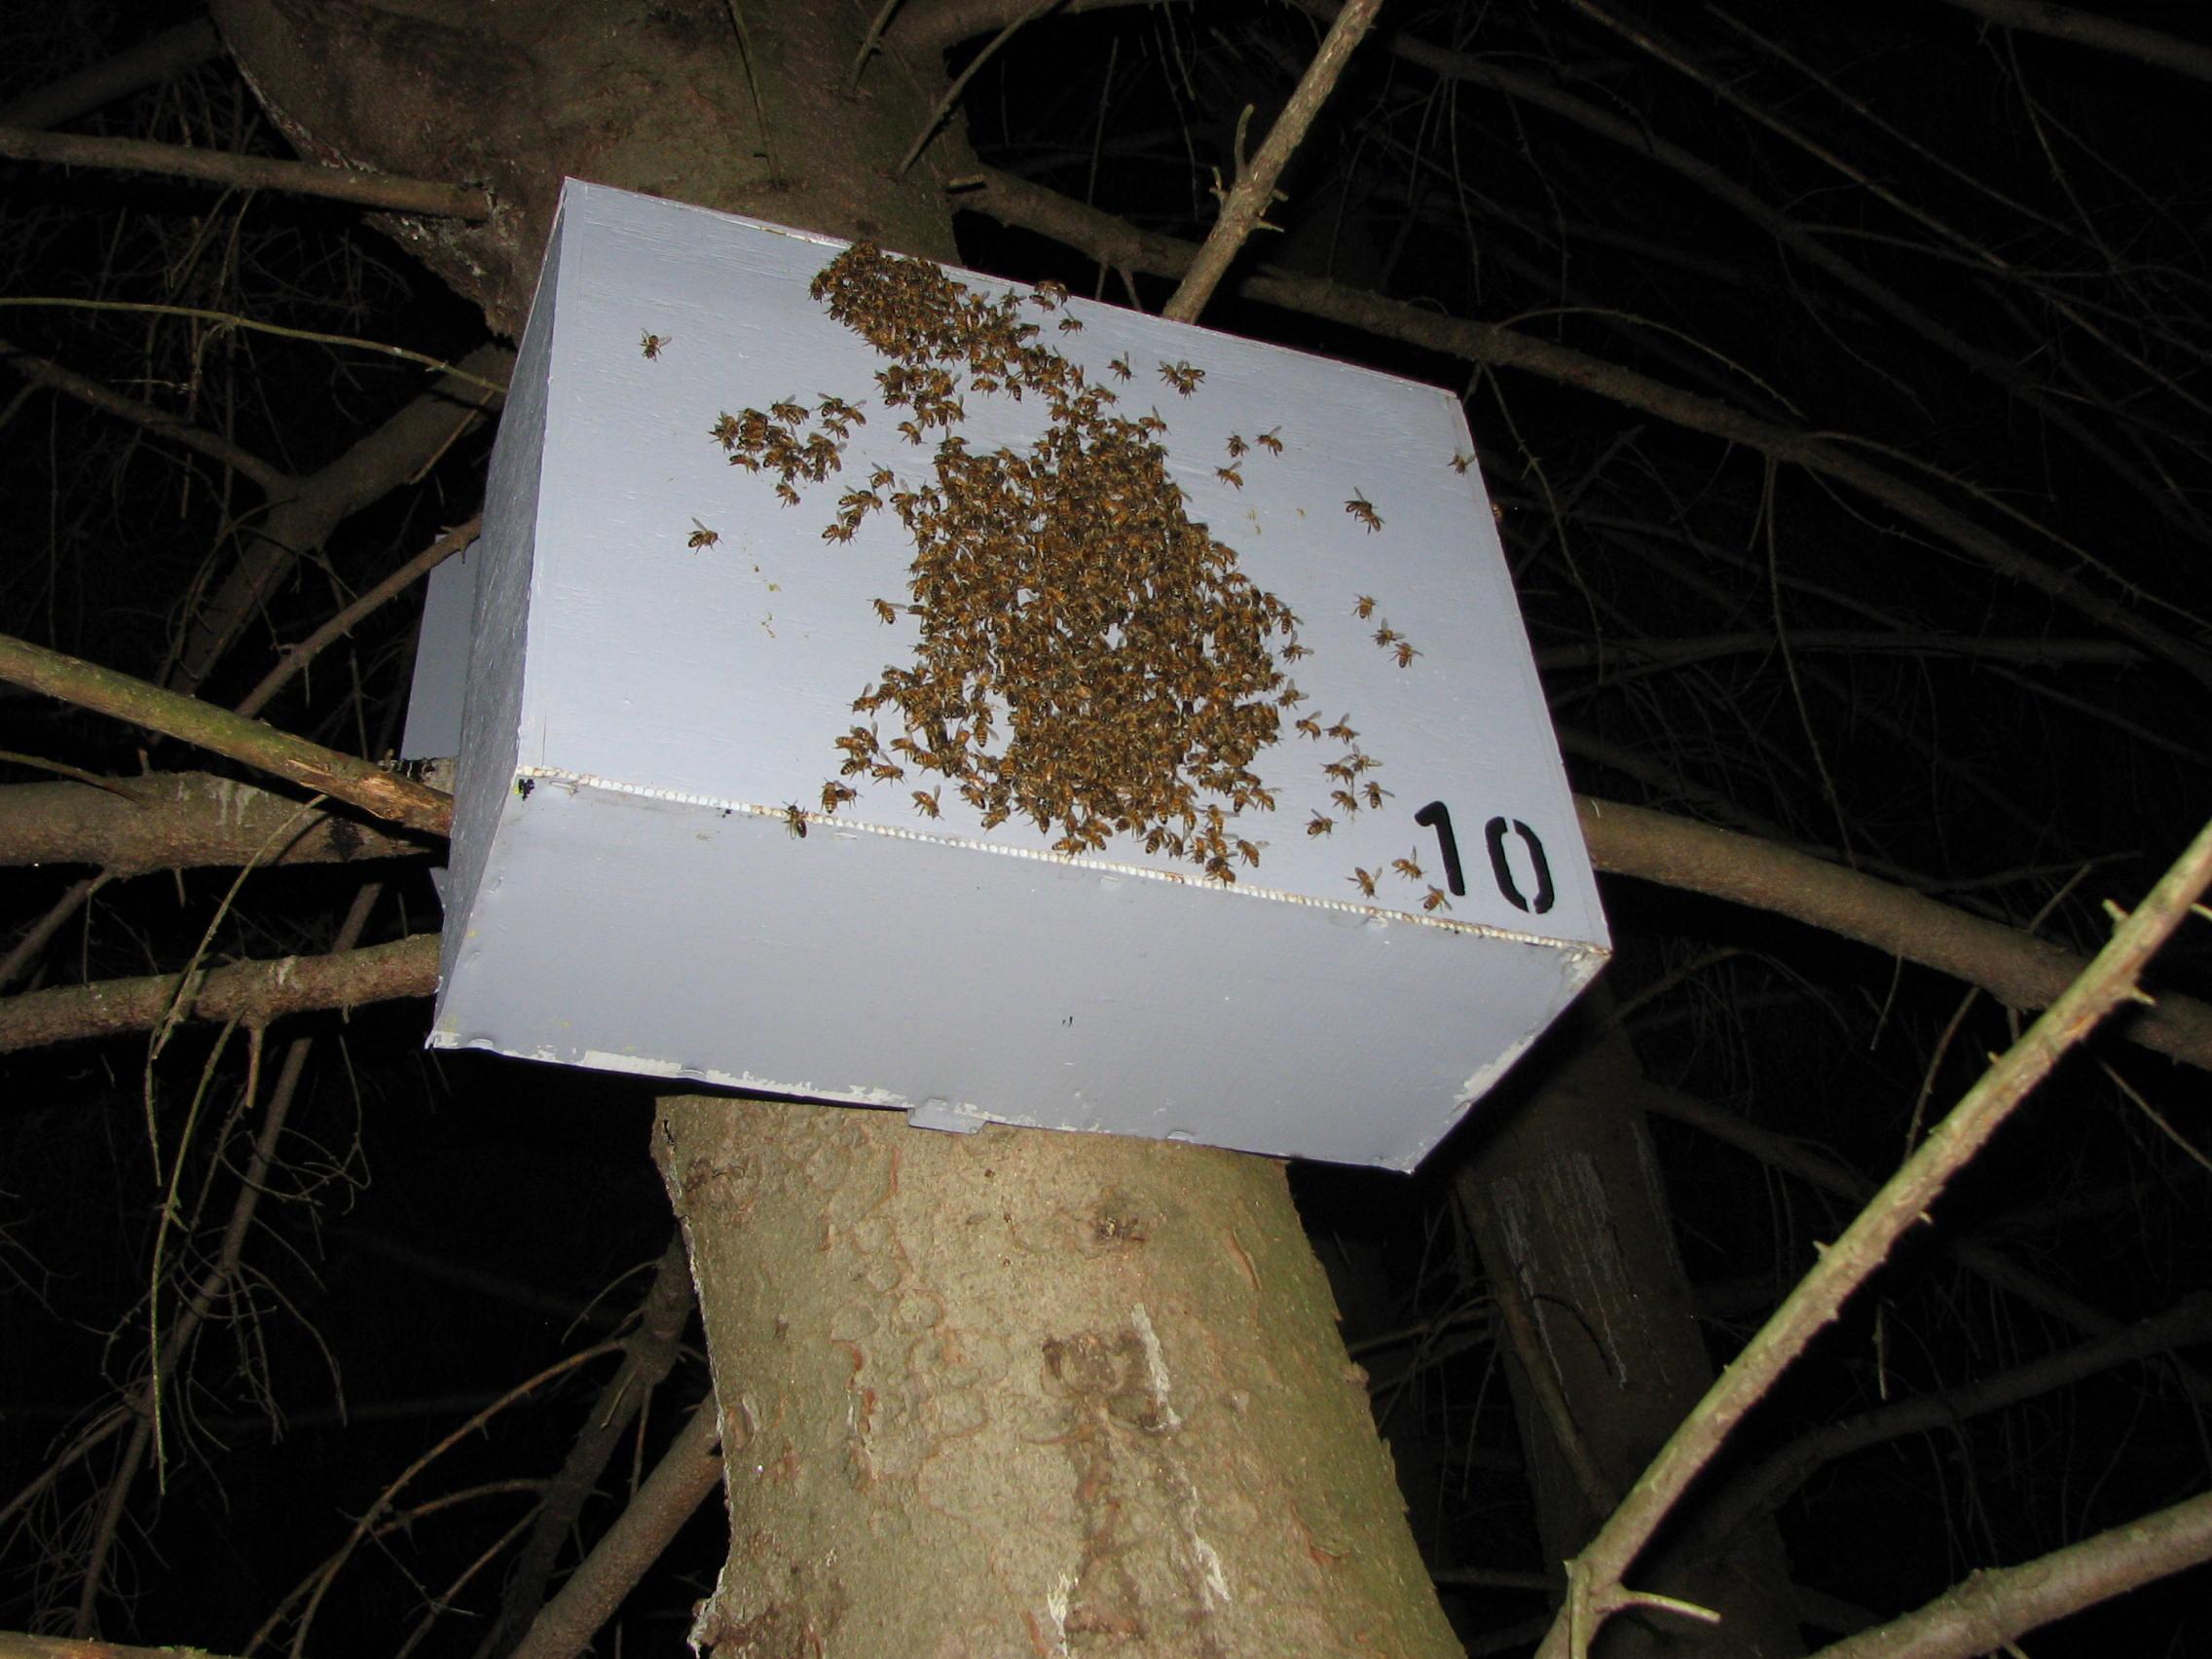 Bushkill Honeybee Swarm Traps